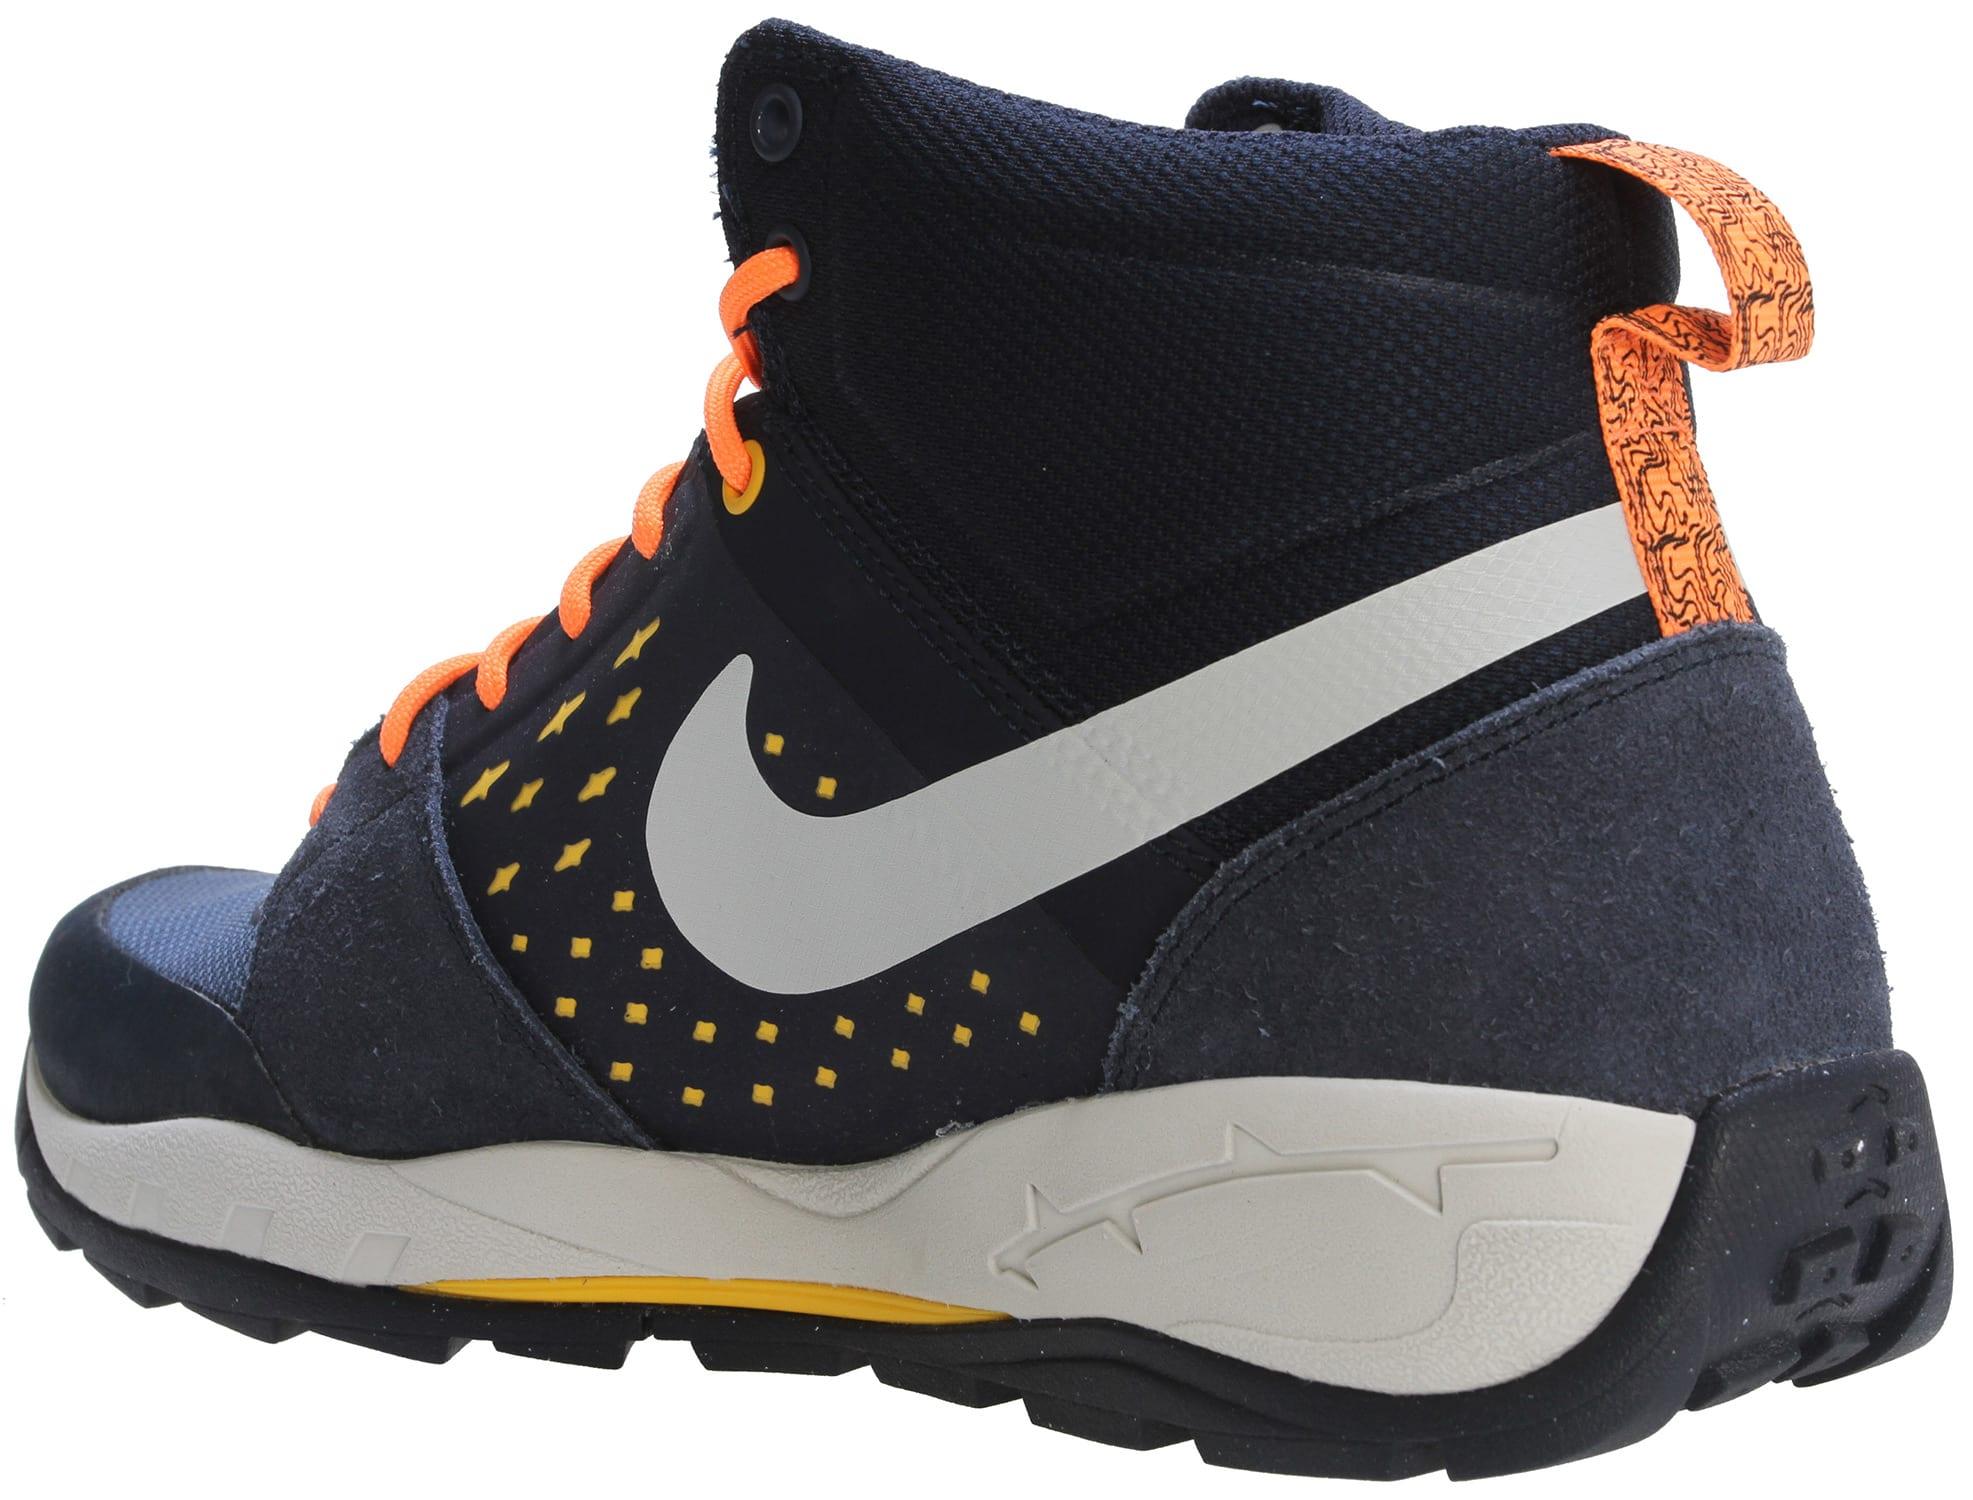 6a437dd9efadc Nike Alder Mid Shoes - thumbnail 3